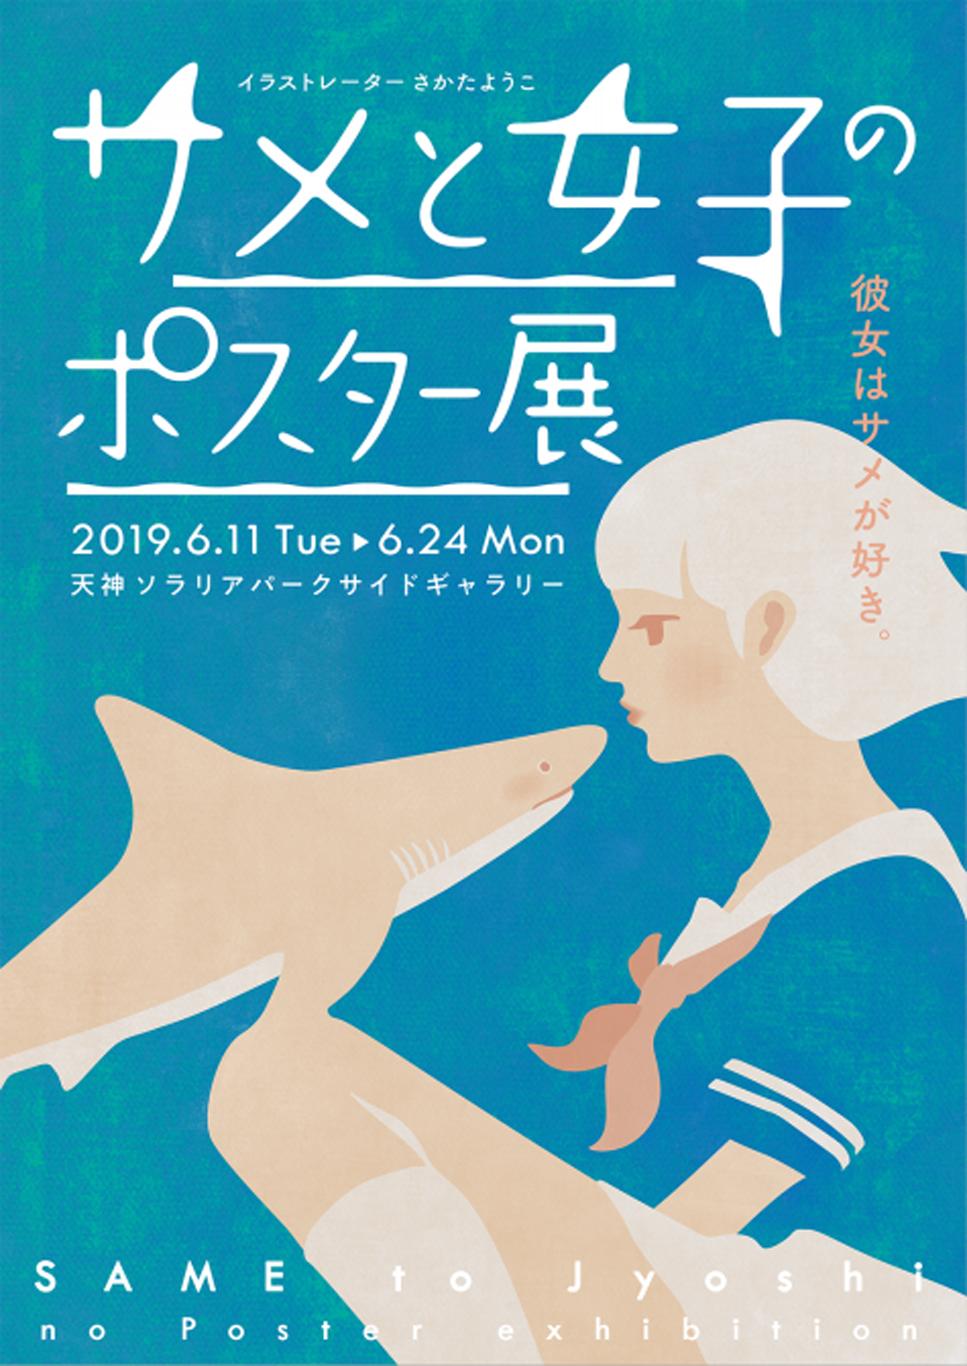 spsg-201906-youko-sakata-exhibition.jpg